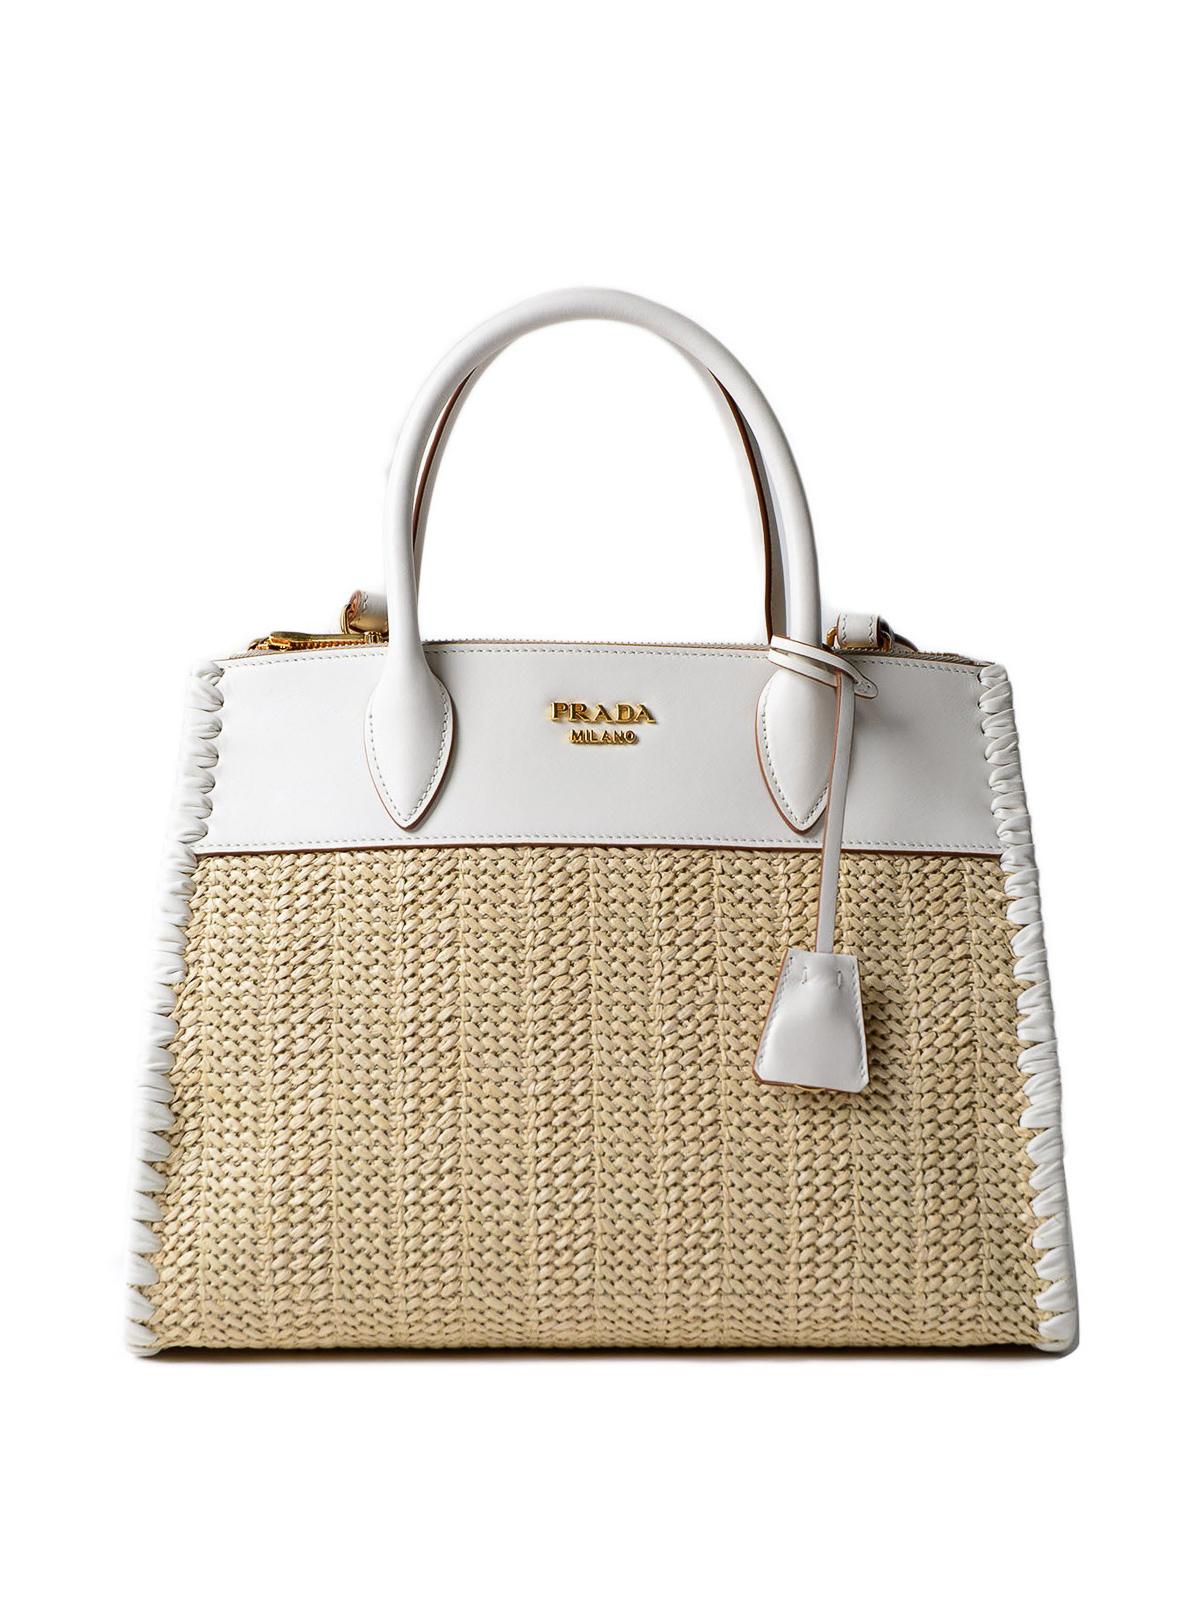 421d7978f1bb Prada - Paradigme leather and raffia tote - totes bags ...